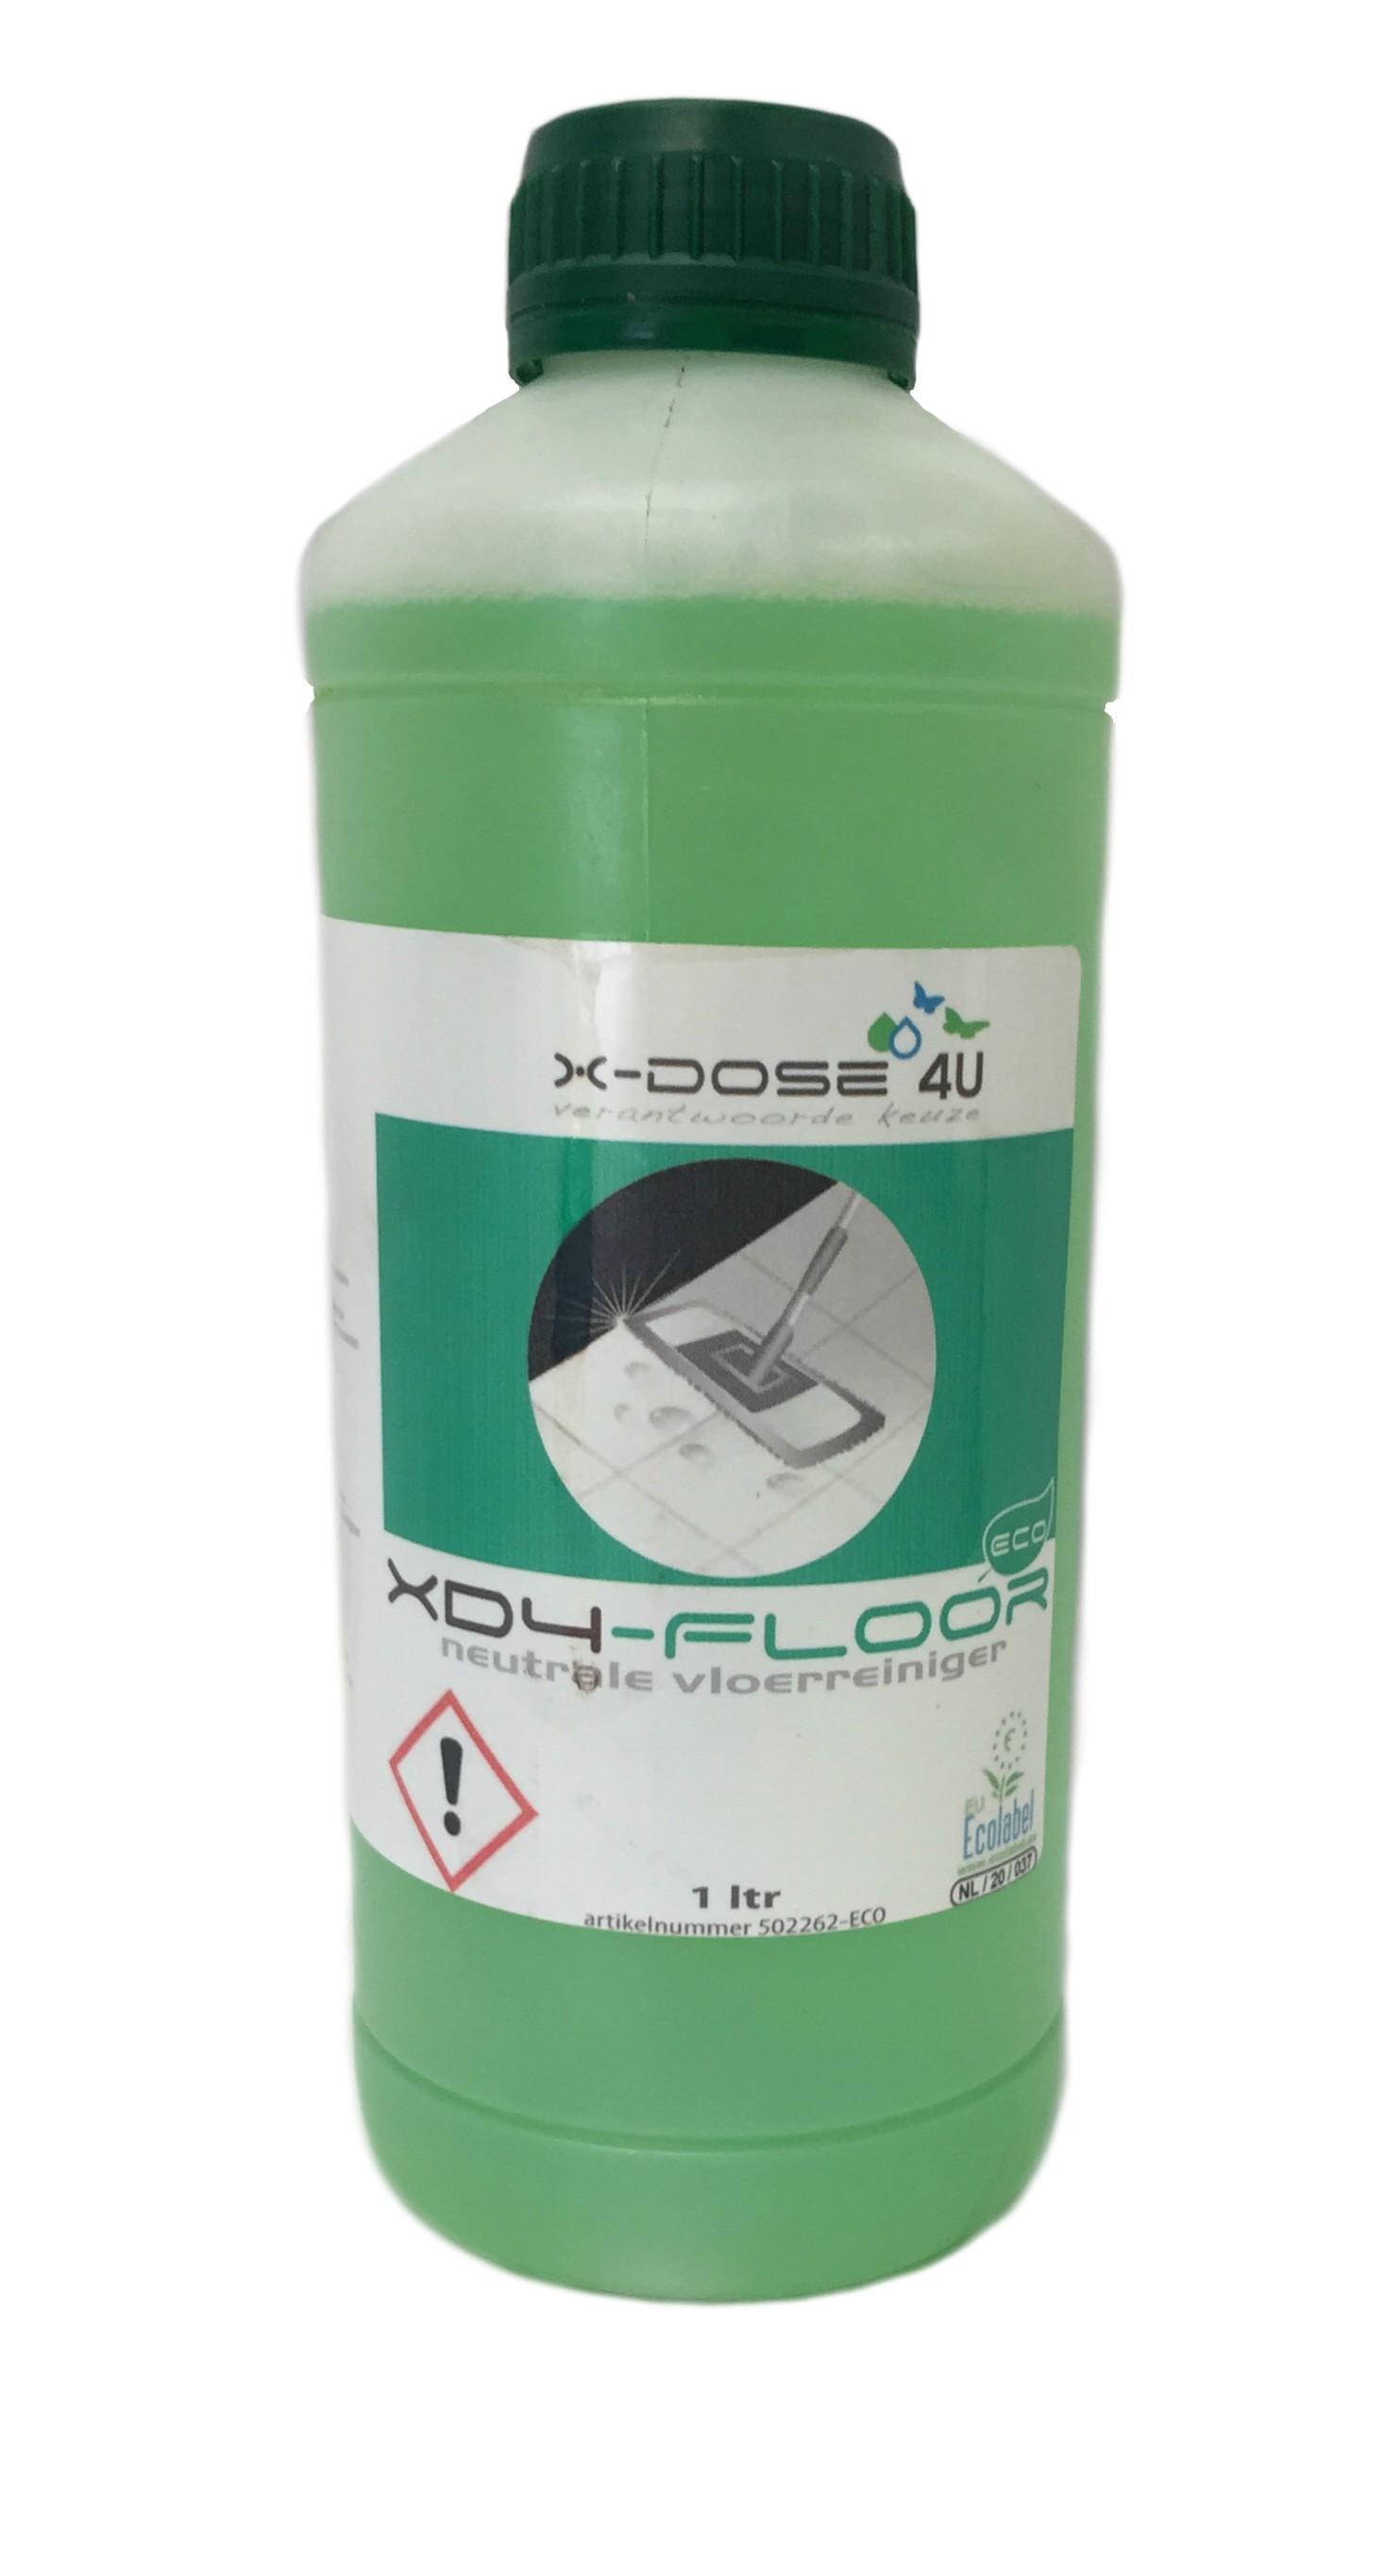 Pro-Floor N neutrale vloerreiniger tbv XD-4 doseersysteem 1 liter ECO